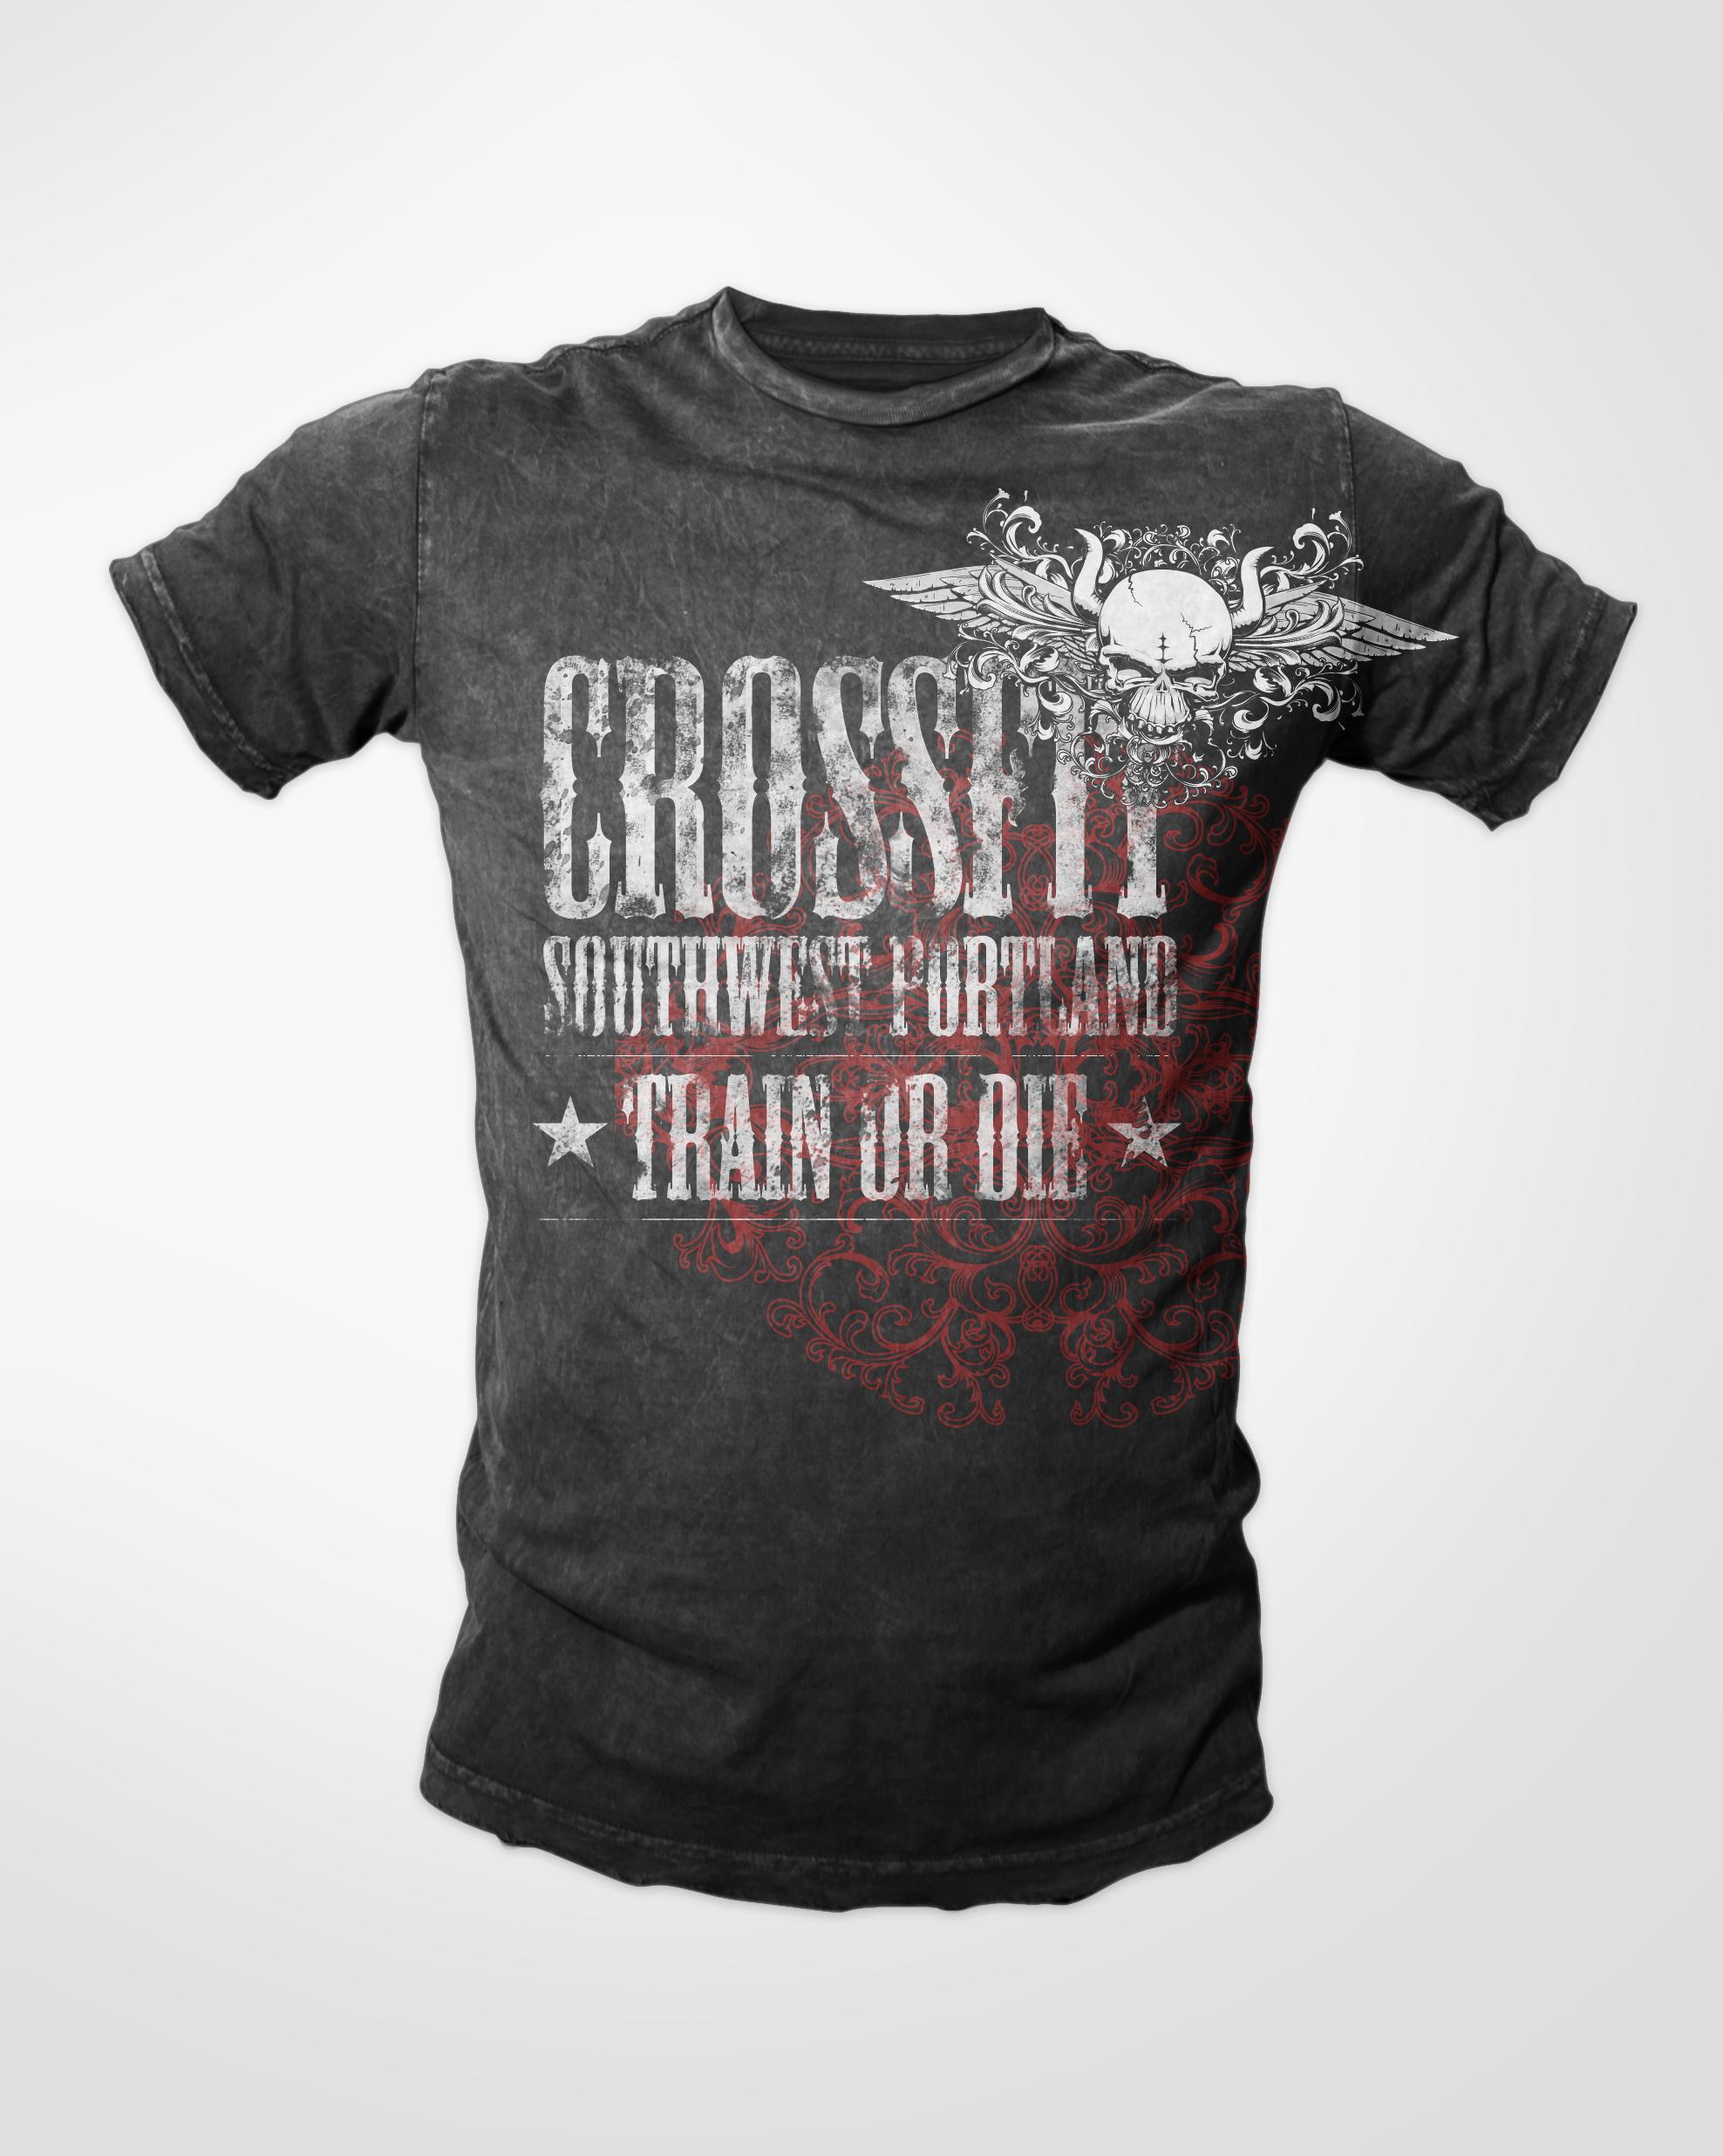 T Shirt Vote Crossfit Sw Portland